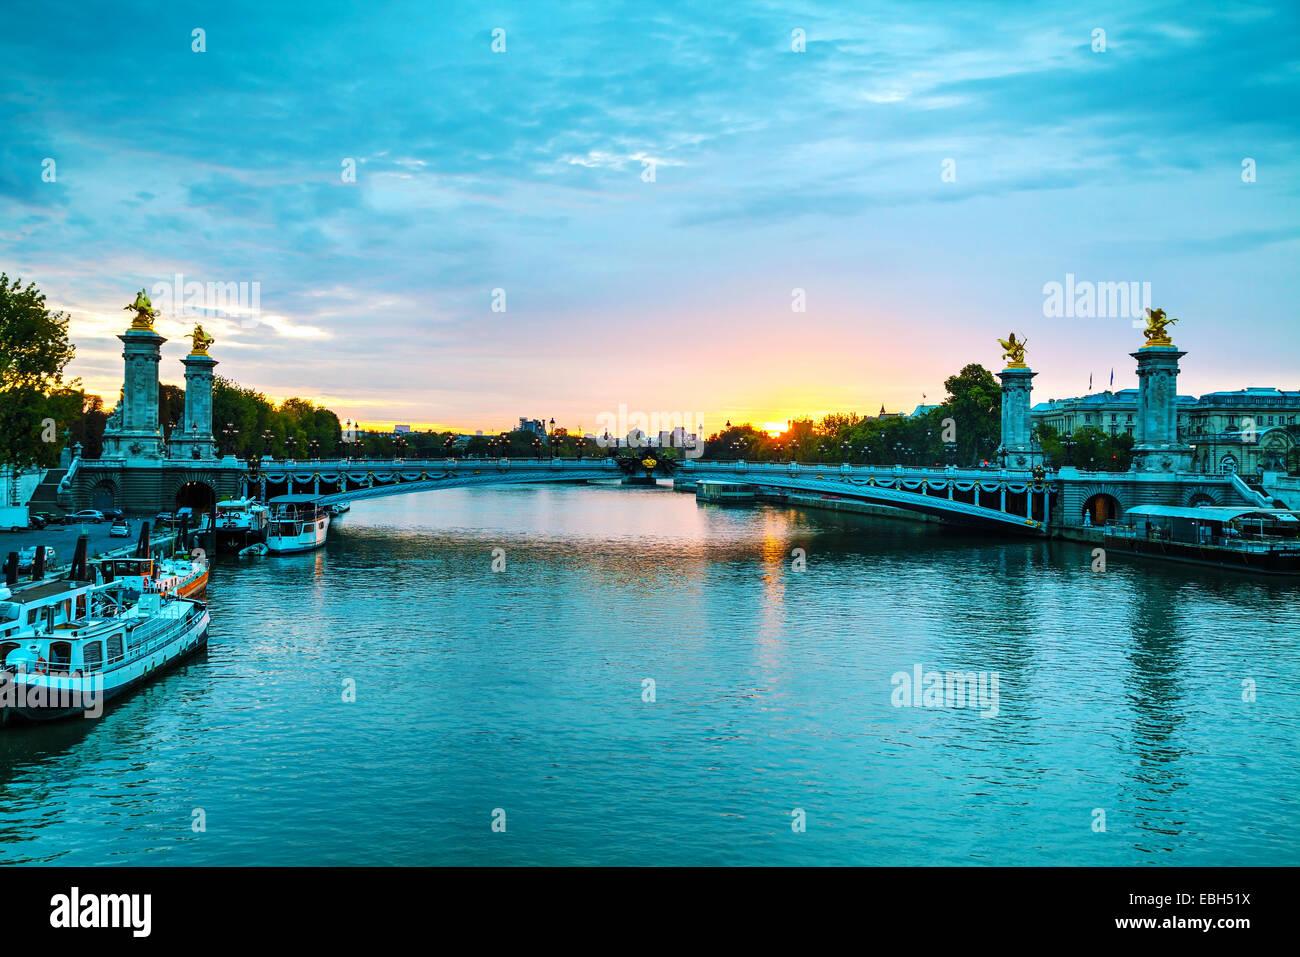 Paris with Aleksander III bridge at sunrise - Stock Image